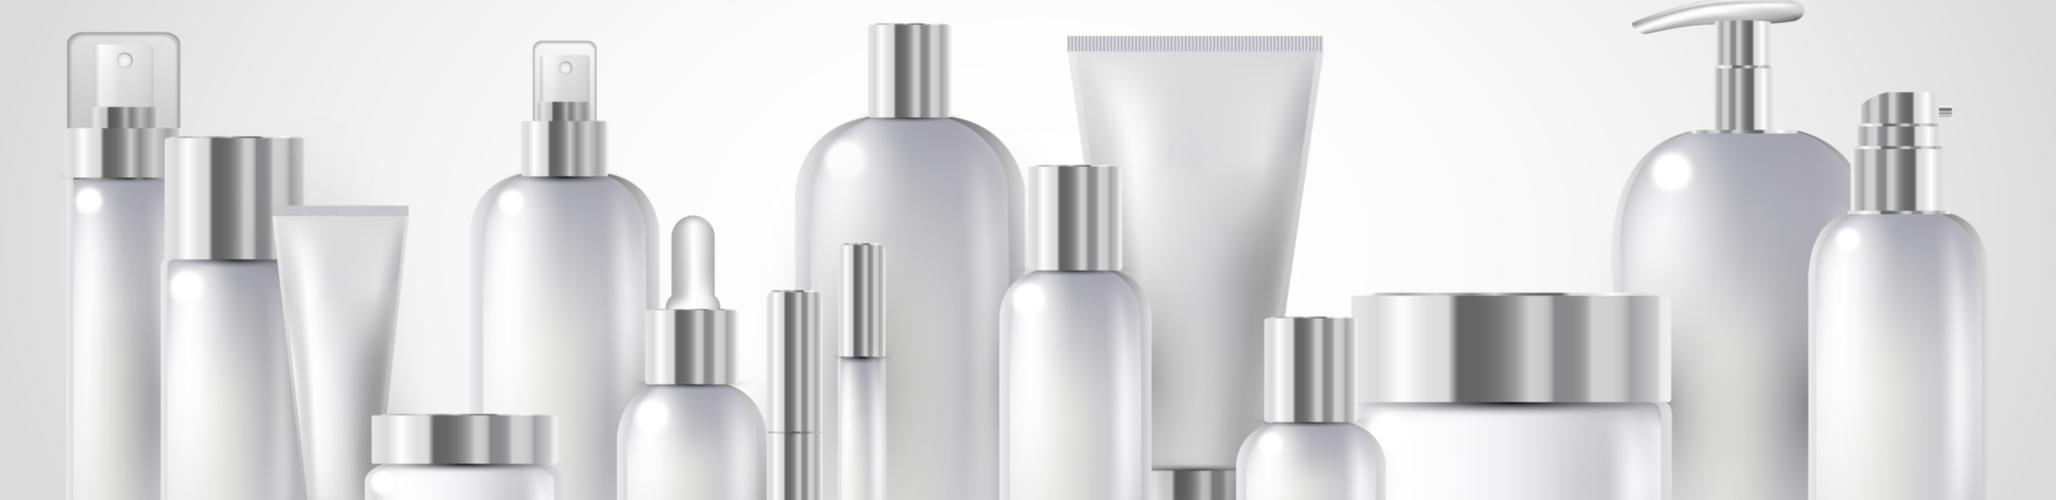 Fason Kozmetik Üretim